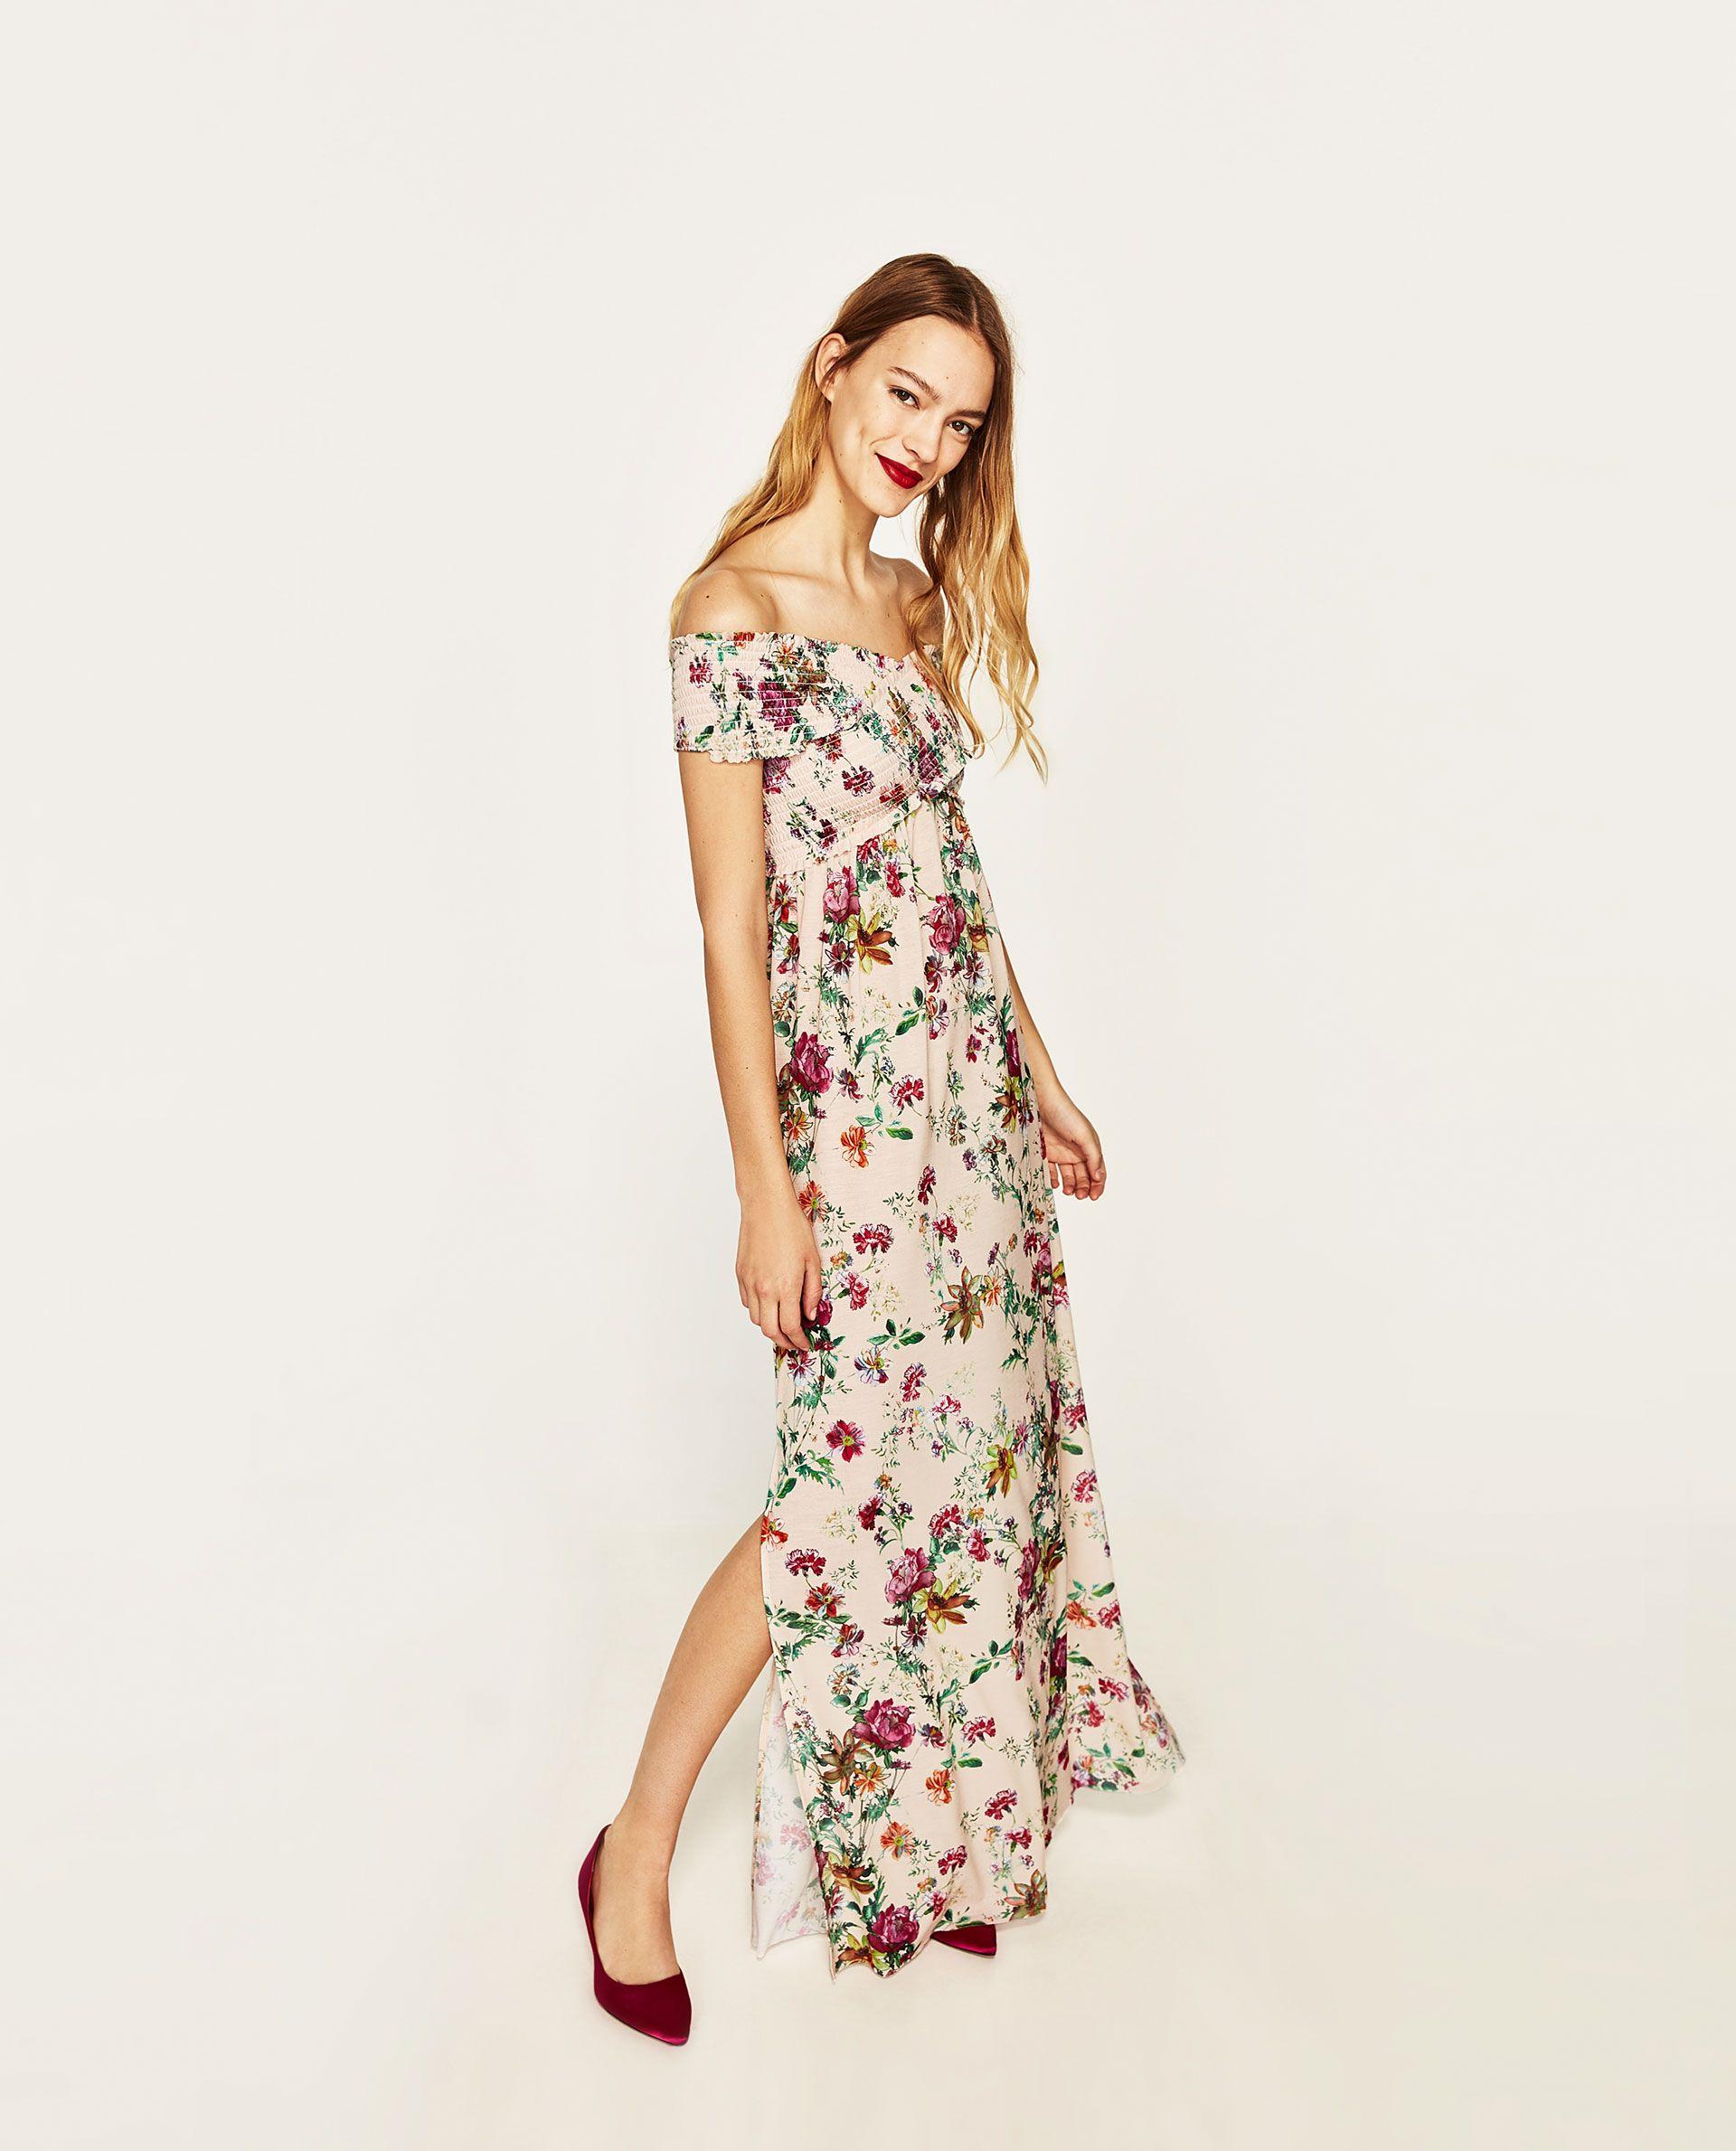 31ea6ec8 VESTIDO LARGO ESTAMPADO FLORAL   don   Dresses, Shirred dress ...